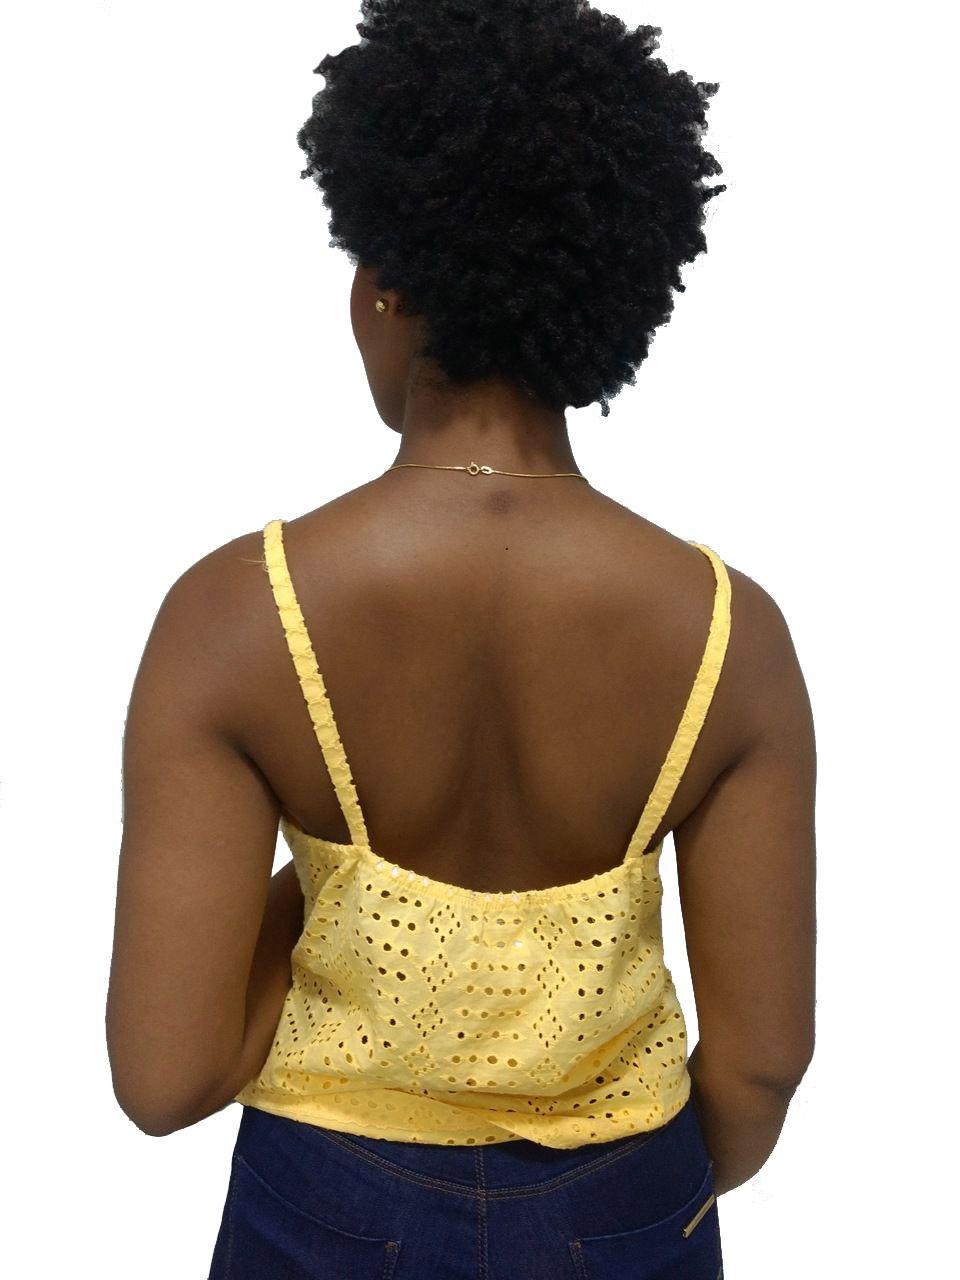 Blusa Feminina Chocris Amarela Regata